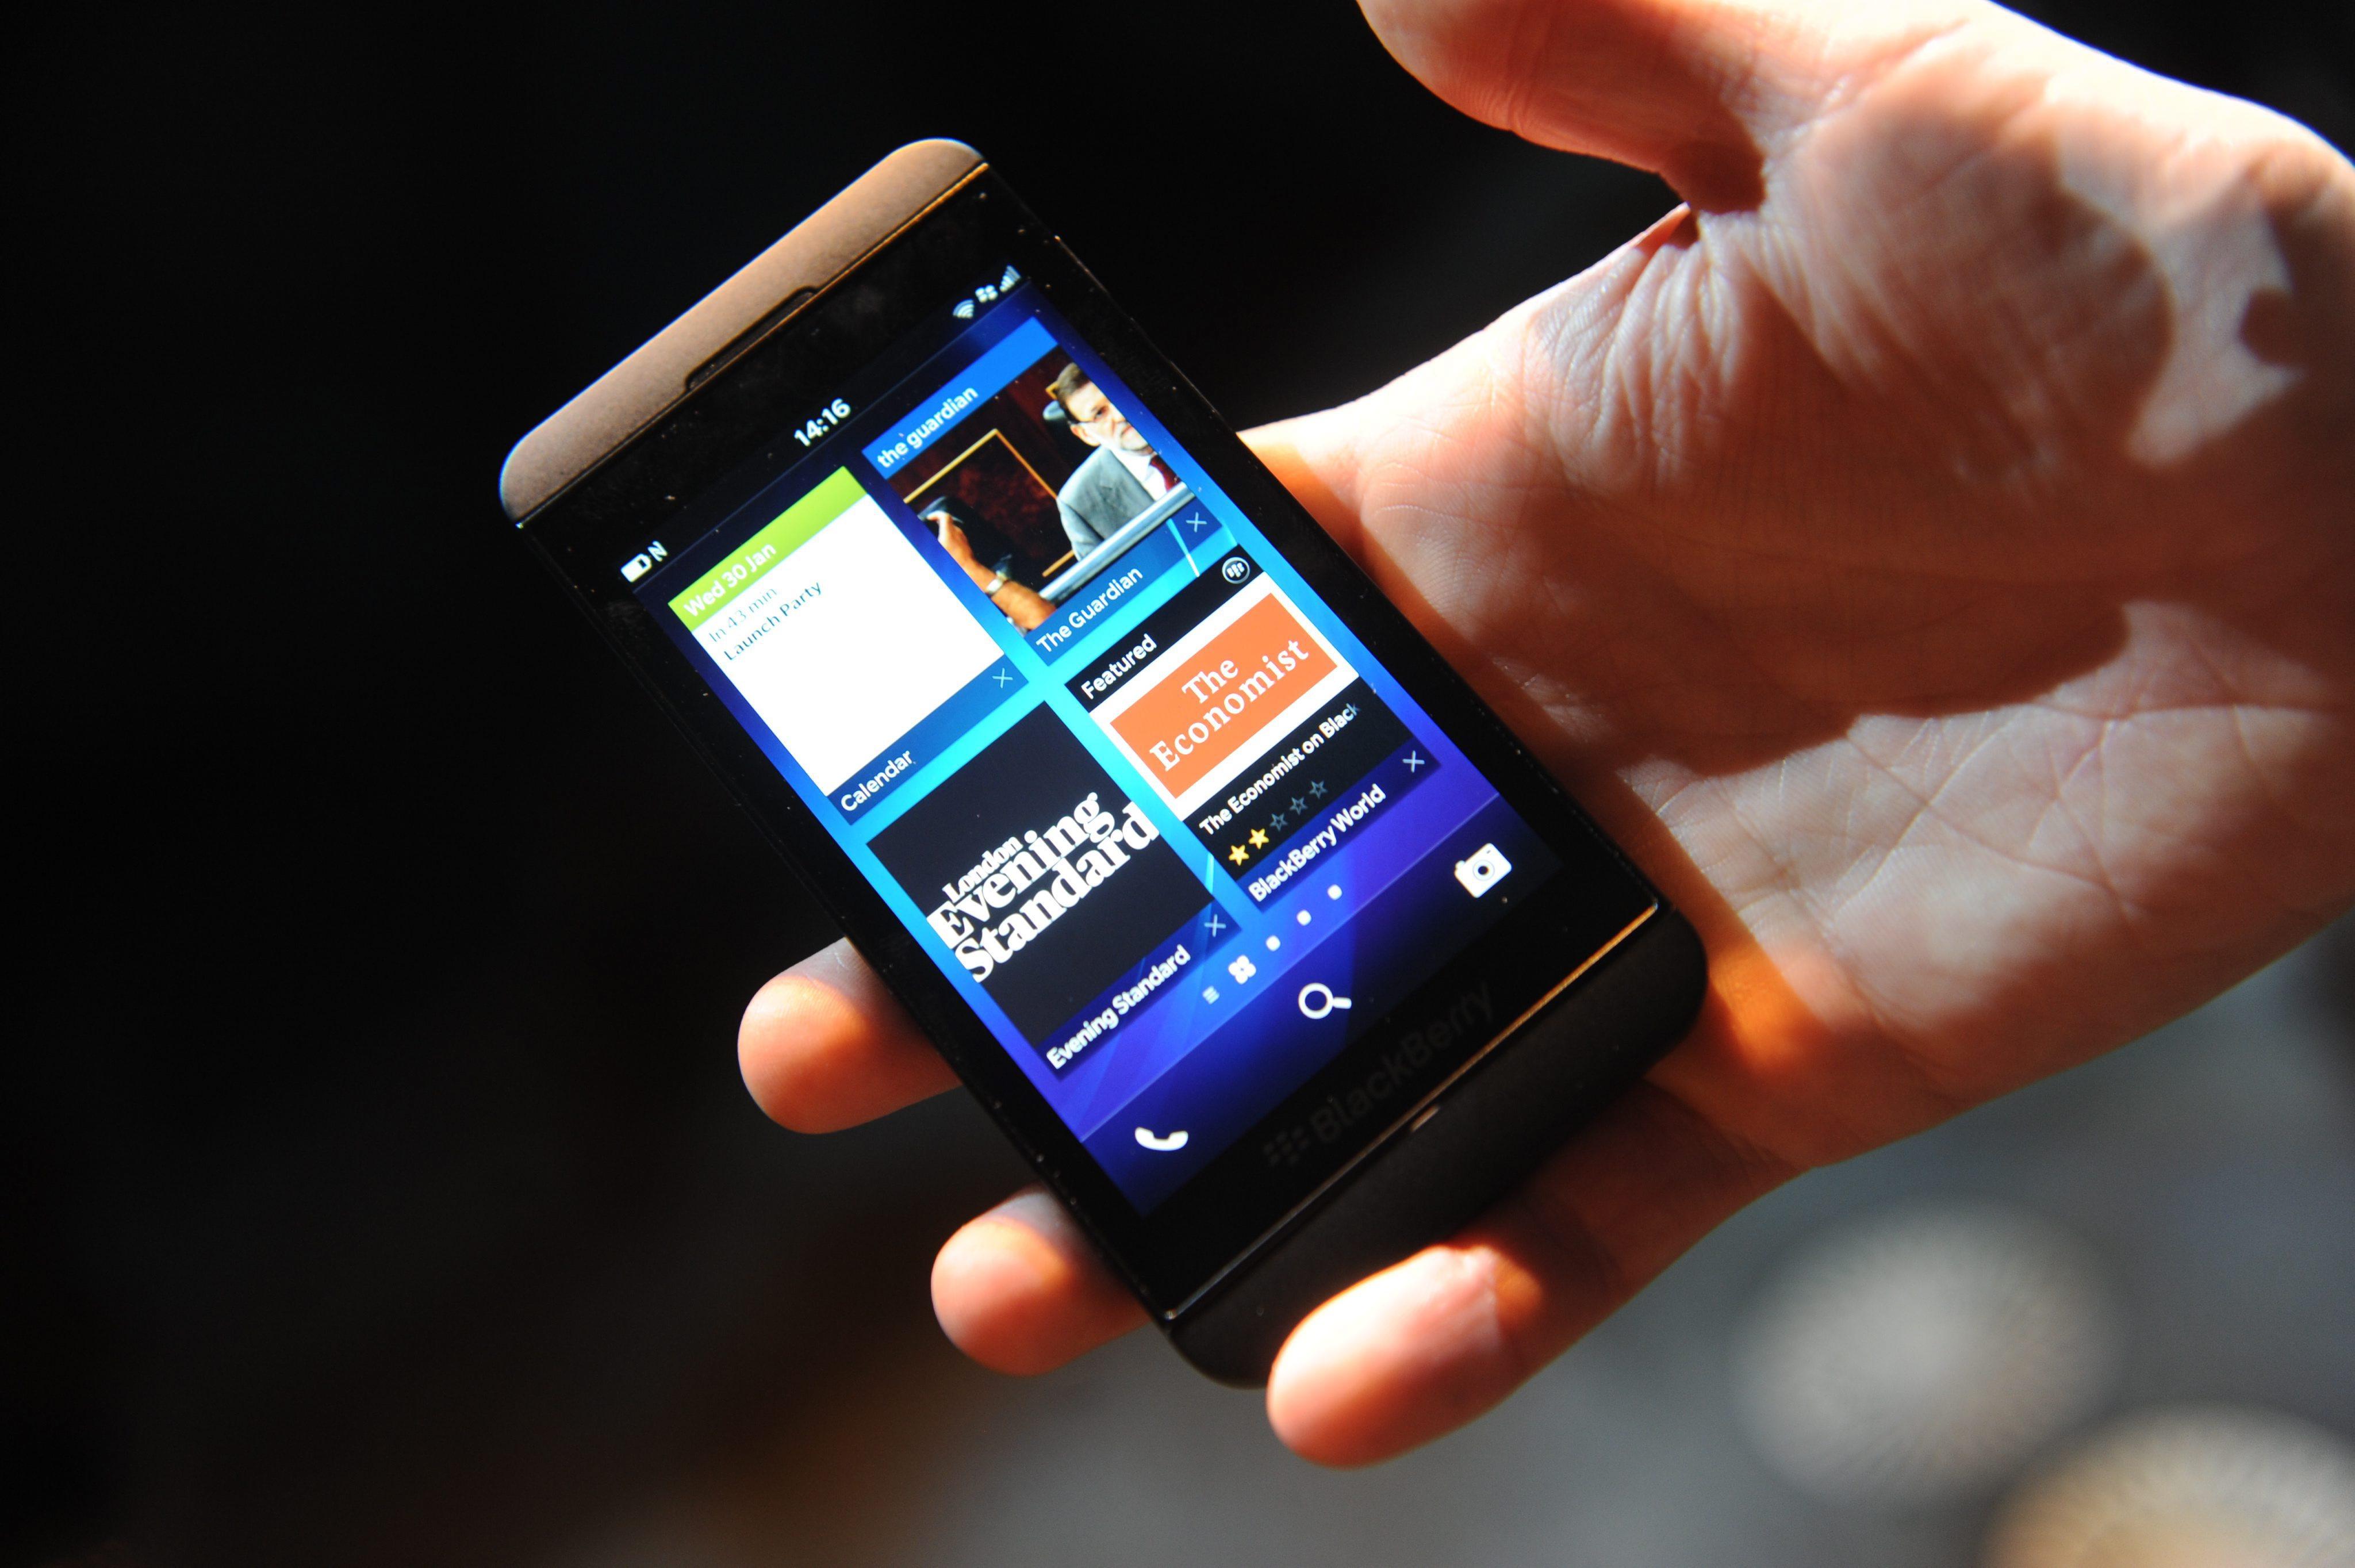 Консорциум купува BlackBerry за $4,7 млрд.